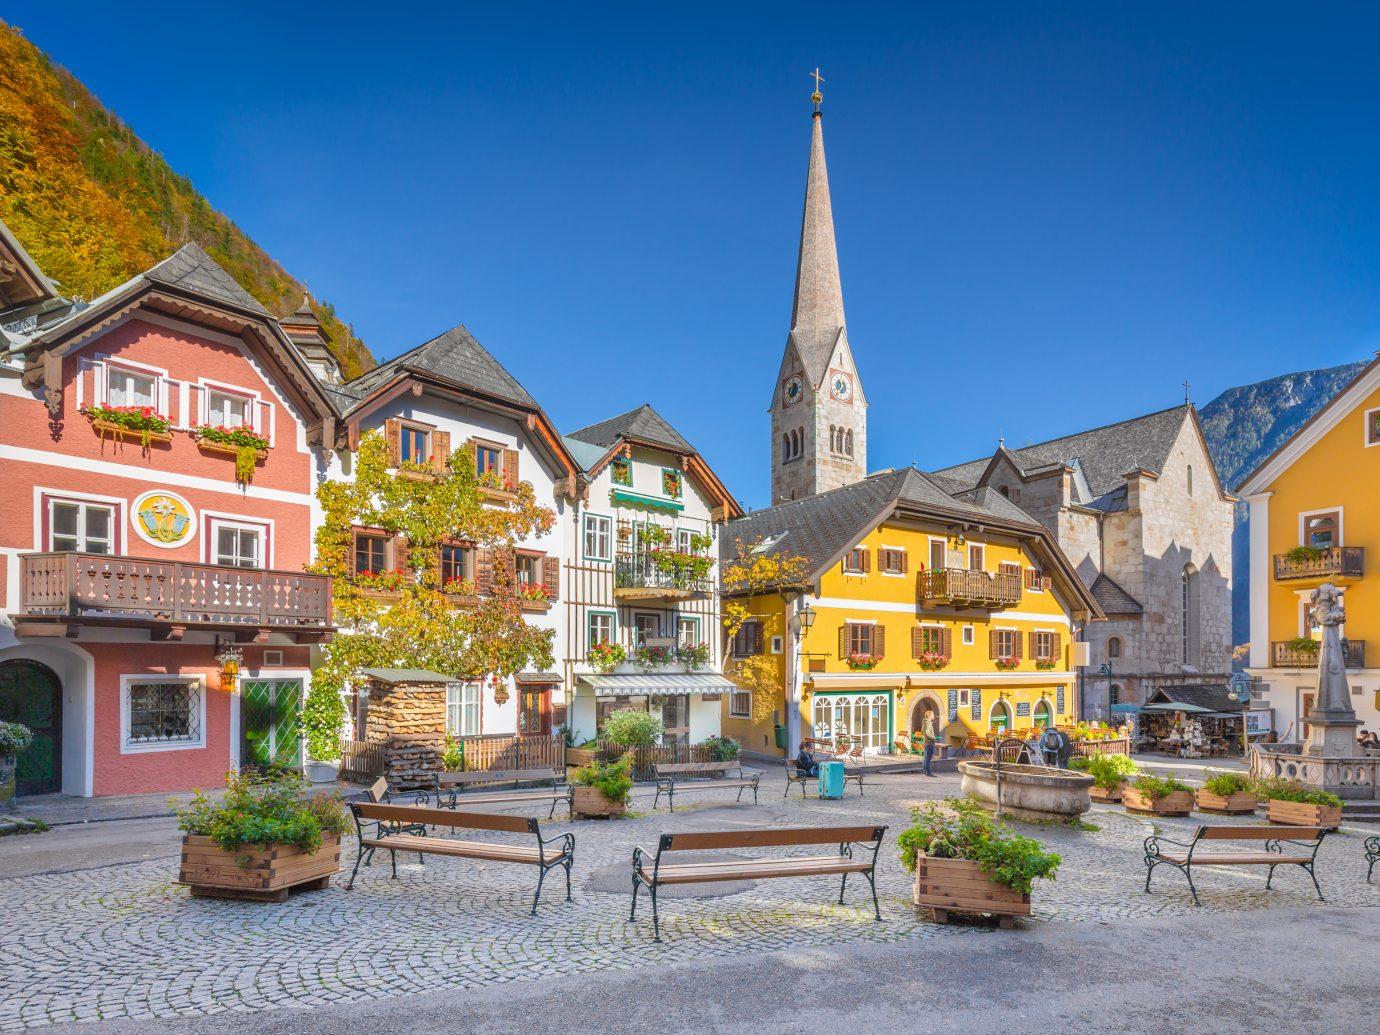 view of the historic town square of Hallstatt Austria